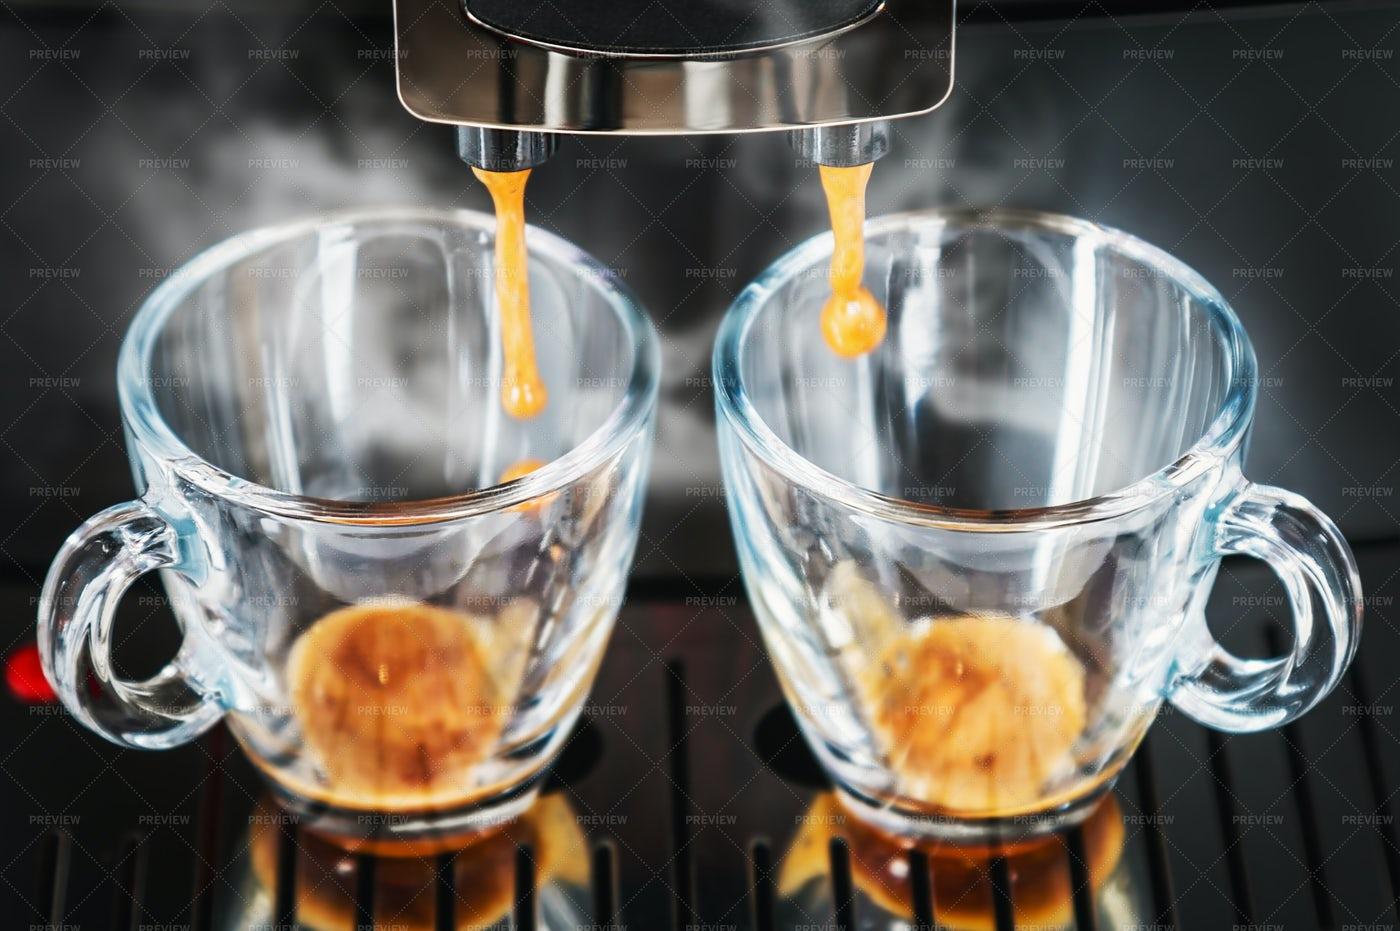 Coffees Under The Machine: Stock Photos